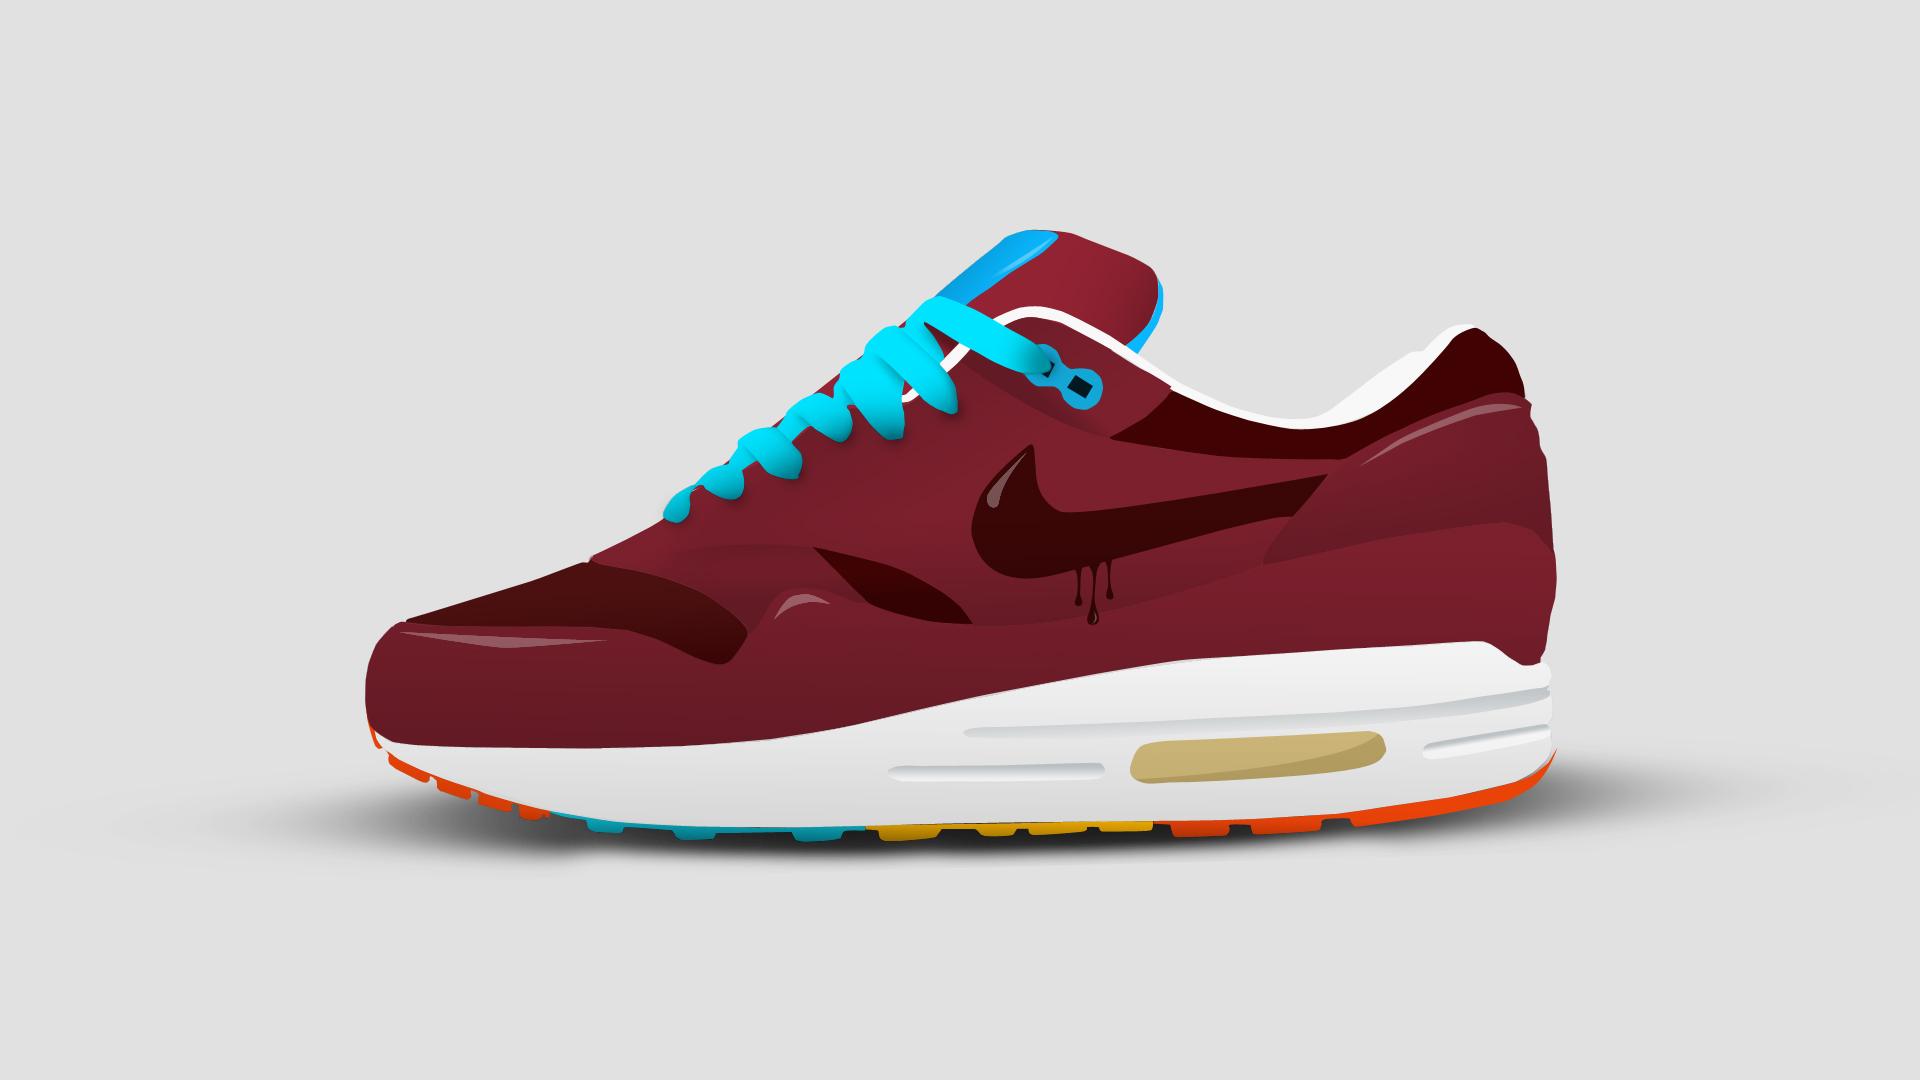 promo code 23975 b4b0f Nike Air Max 1 Cartoon by IModernArts  Vector ...